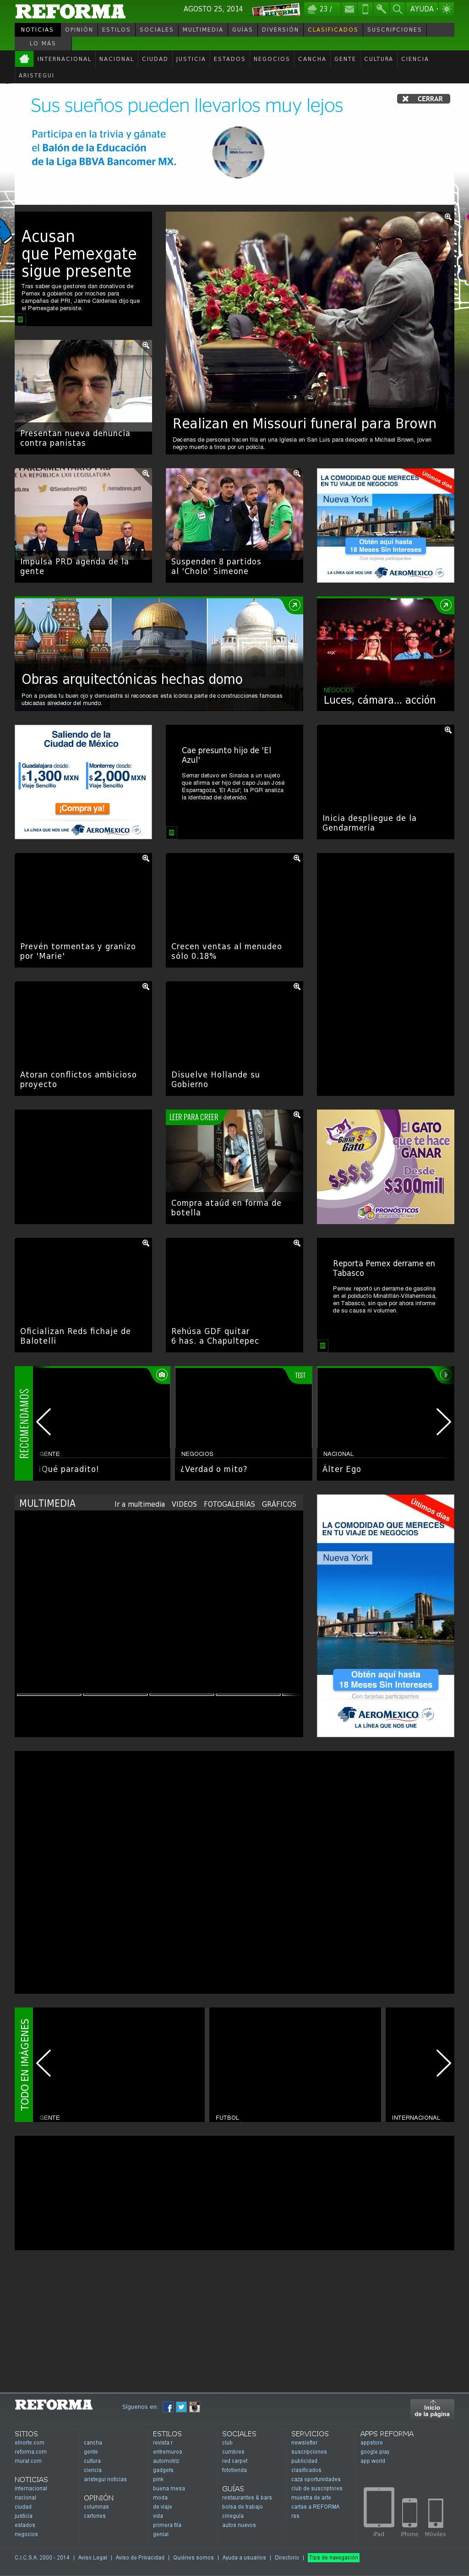 Reforma.com at Monday Aug. 25, 2014, 5:19 p.m. UTC